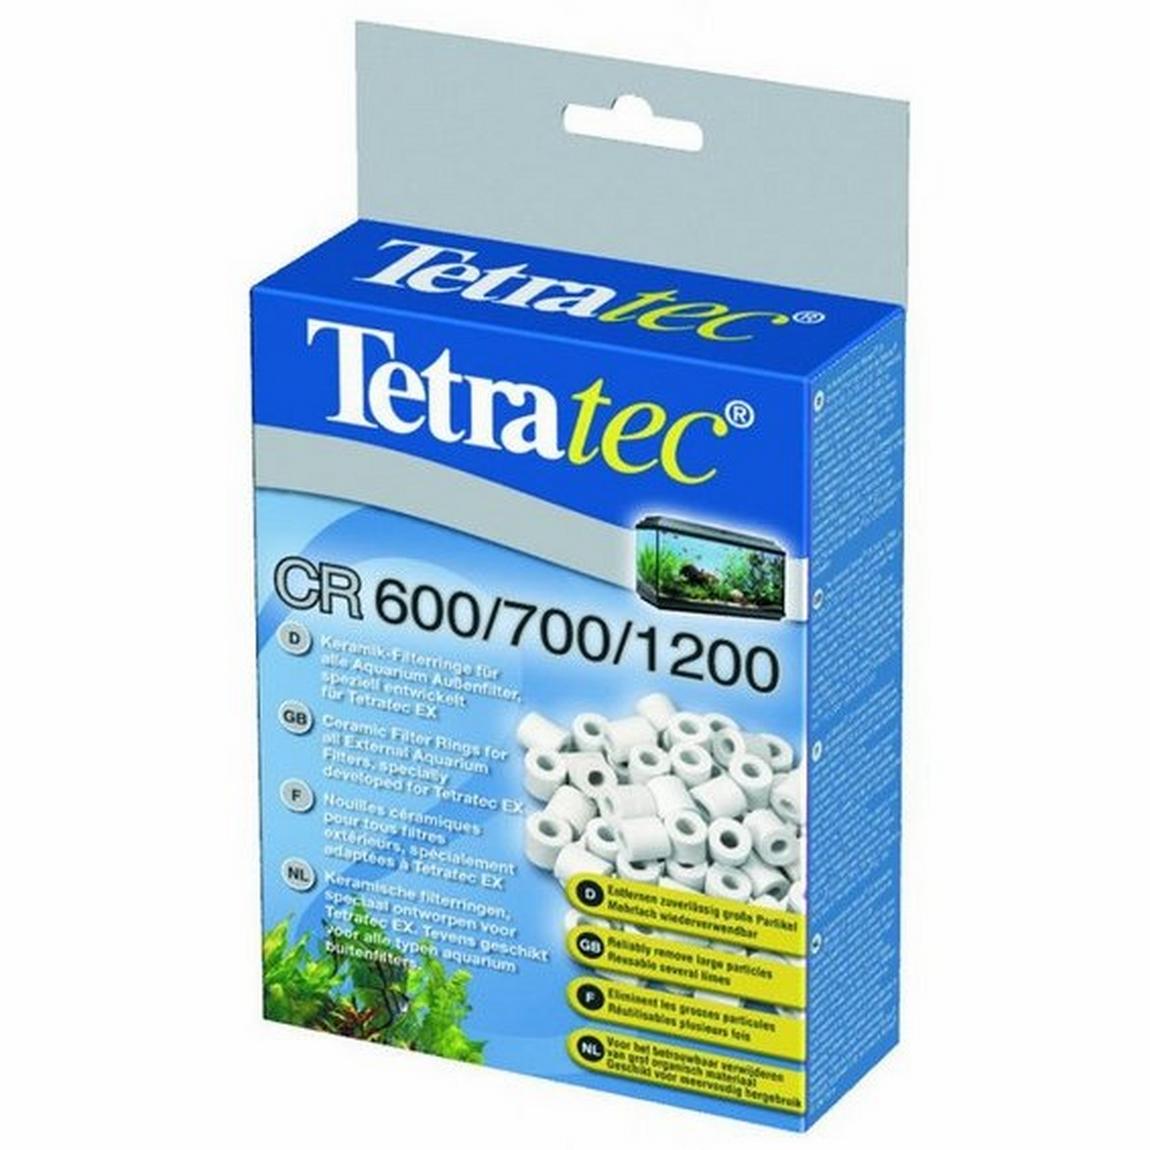 Tetratec Material Filtrant Ex Cr 600/700/1200 imagine